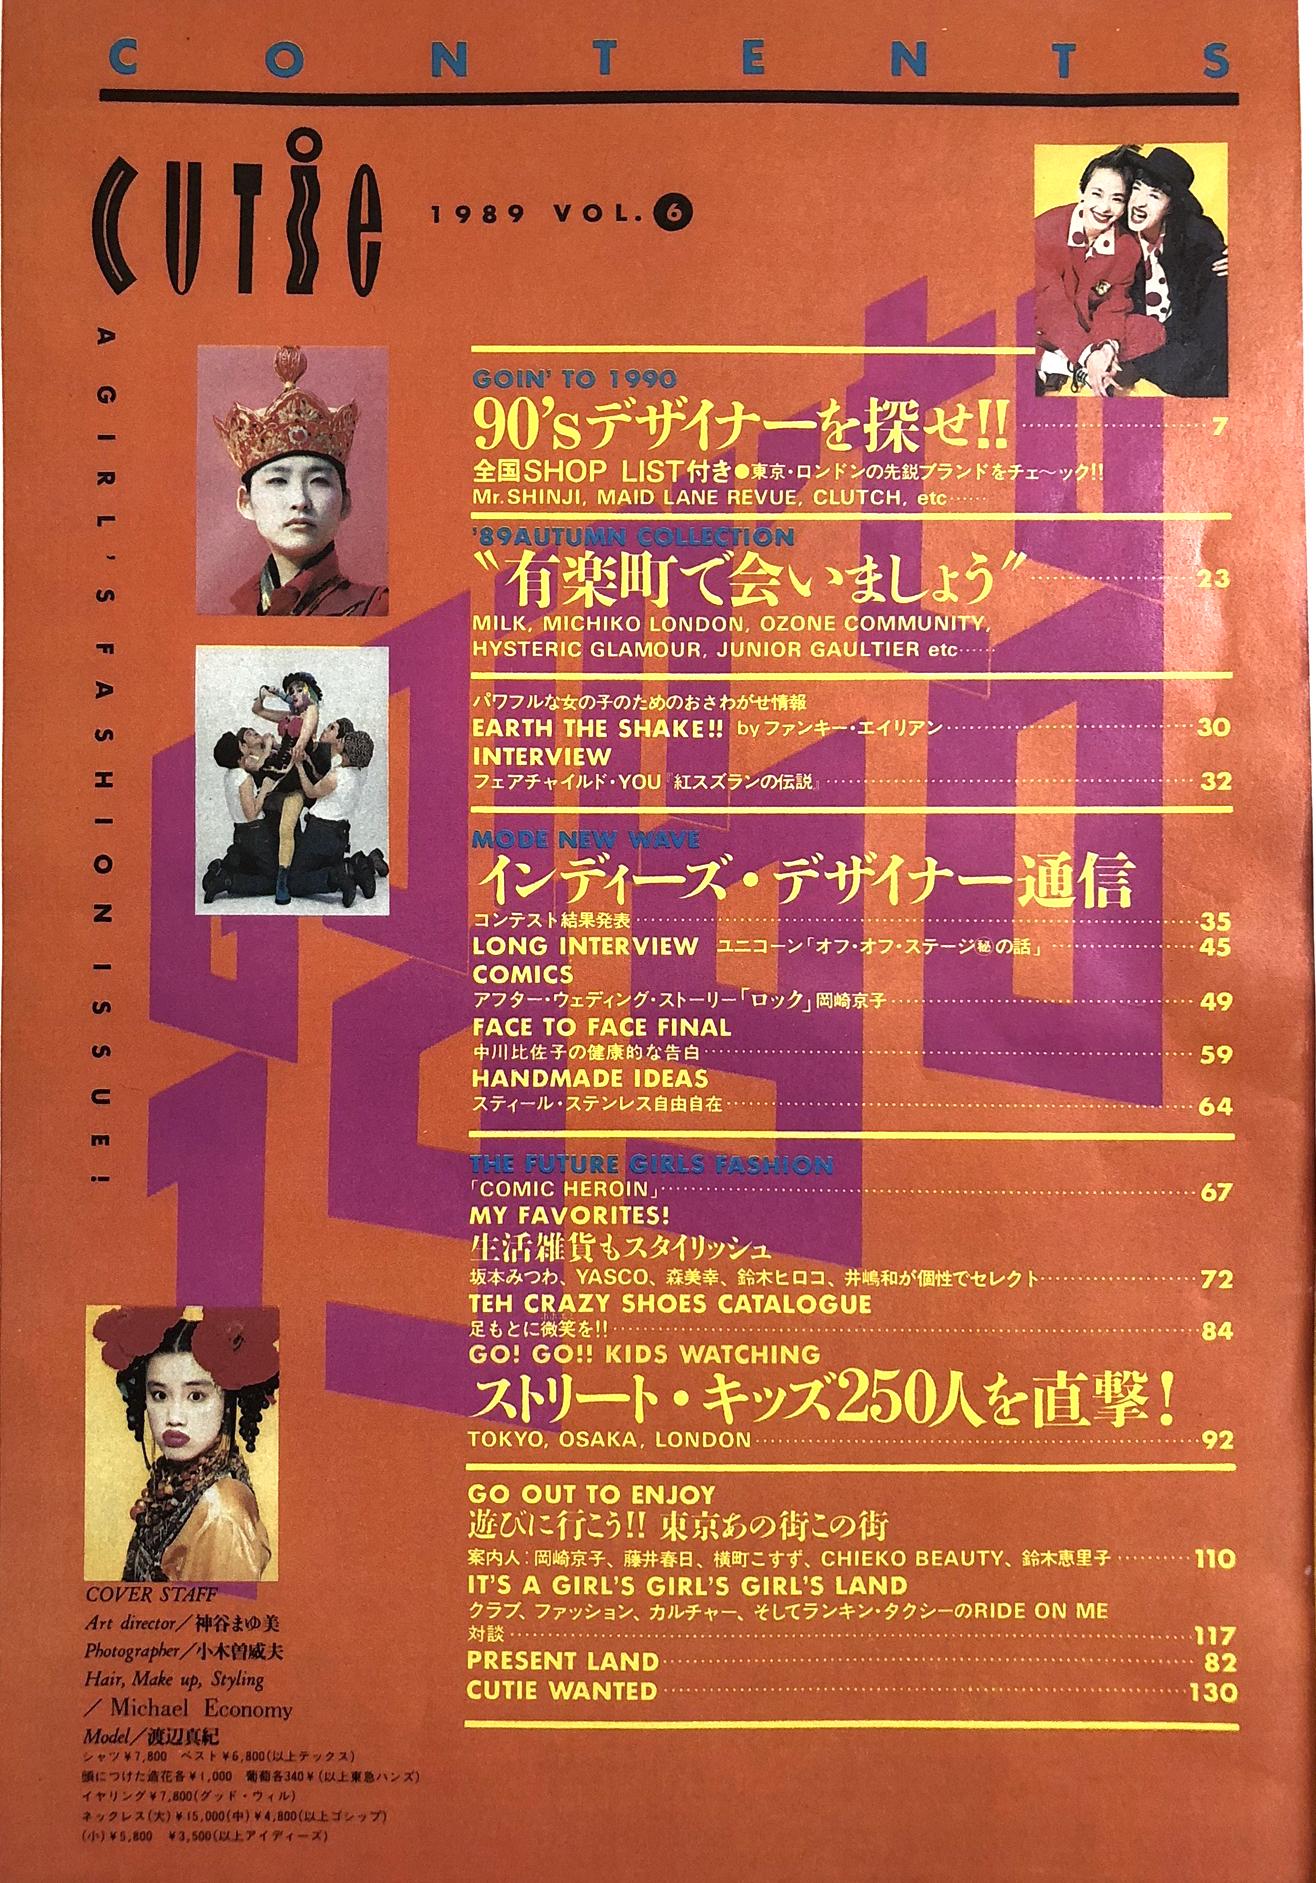 10_CUTIE1989年vol.6.JPEG